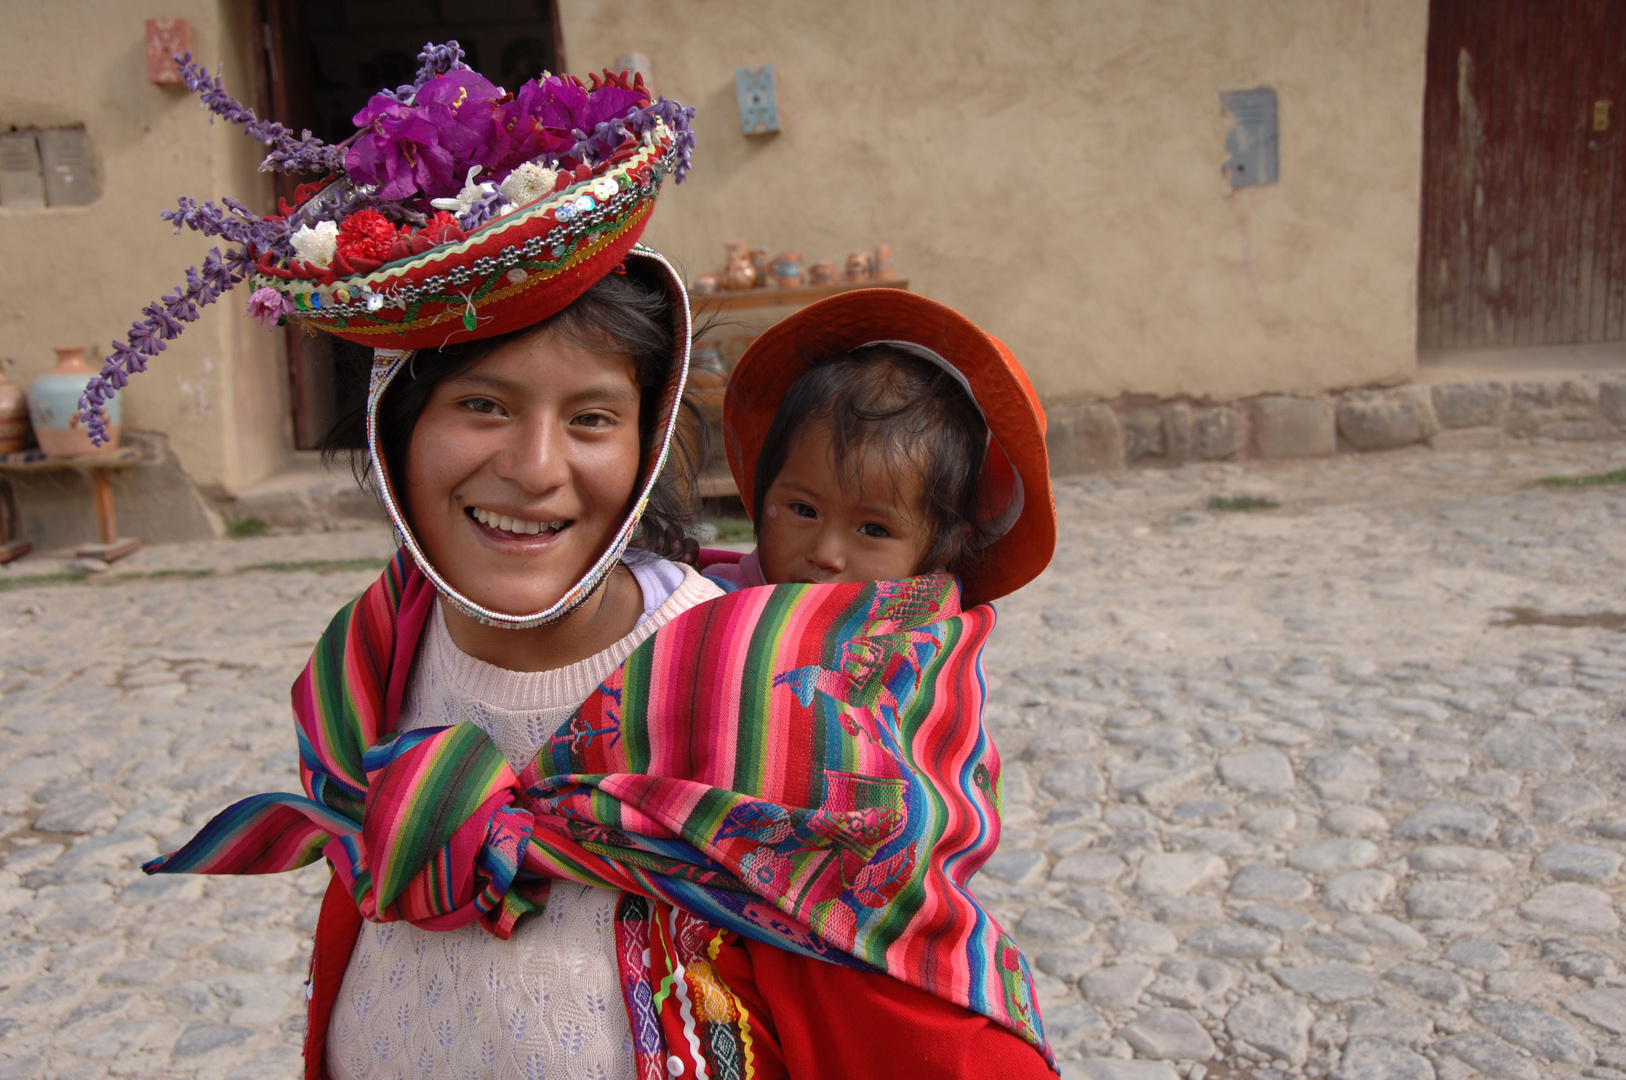 Mutter und Kind, Peru